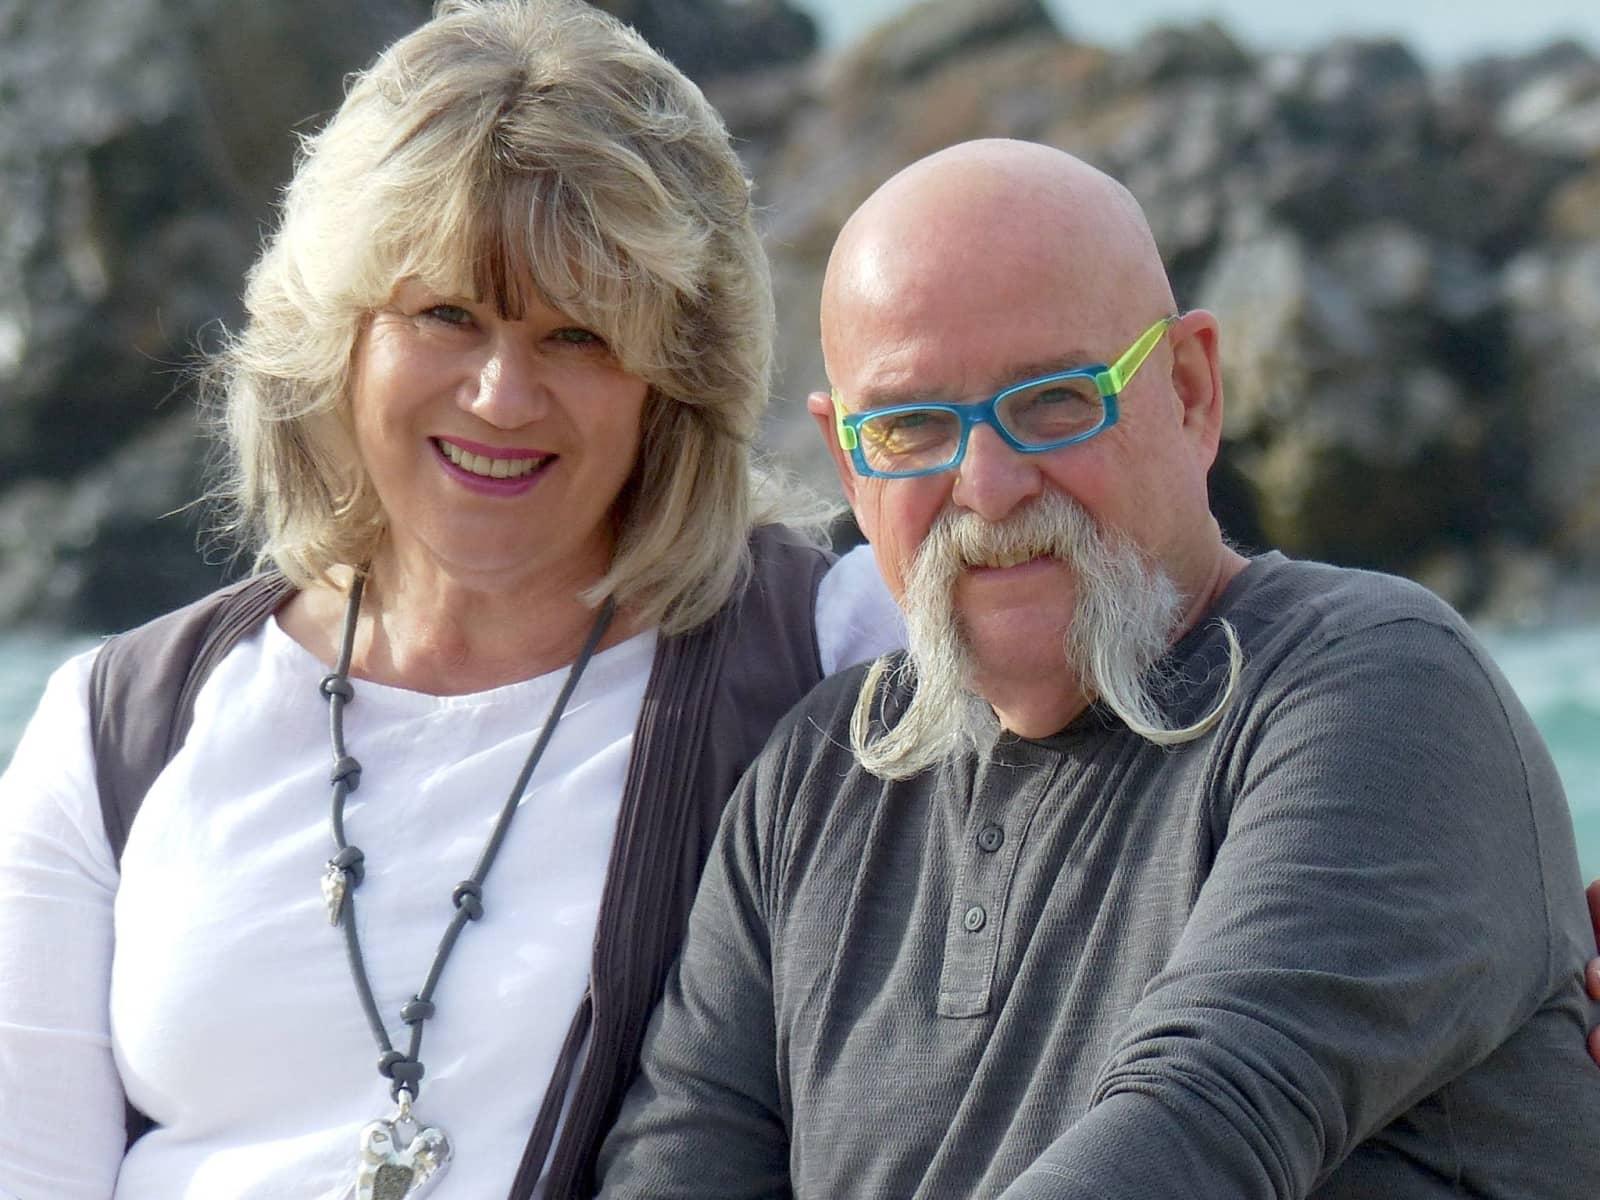 Rosalie & Carl from Port Macquarie, New South Wales, Australia